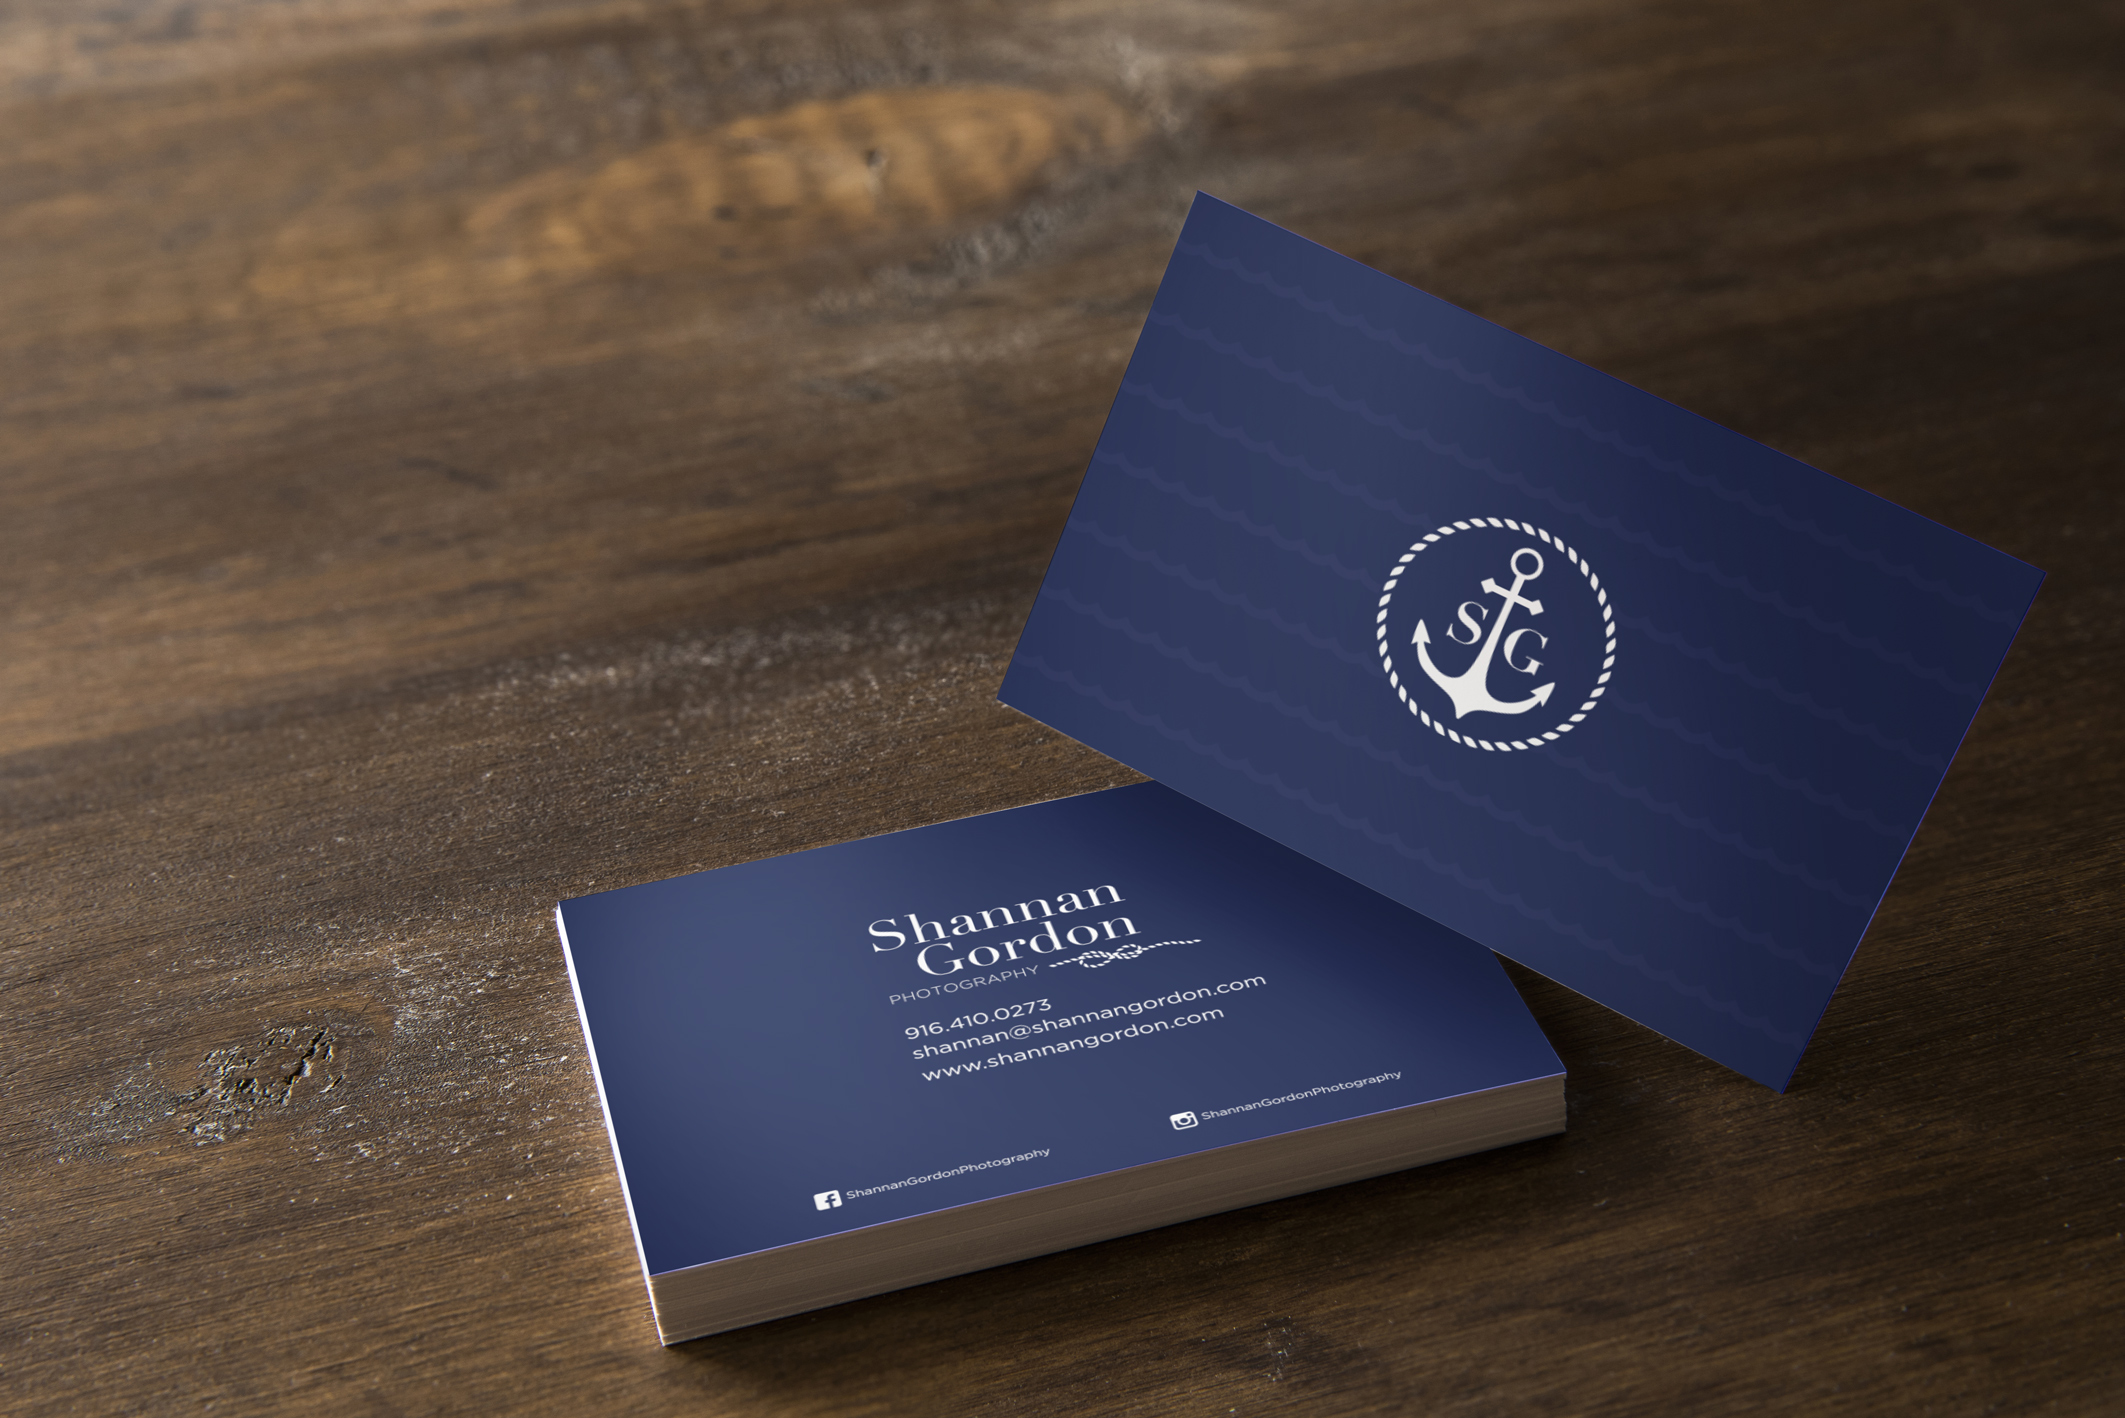 Business Card Design -Shannan Gordon Photography